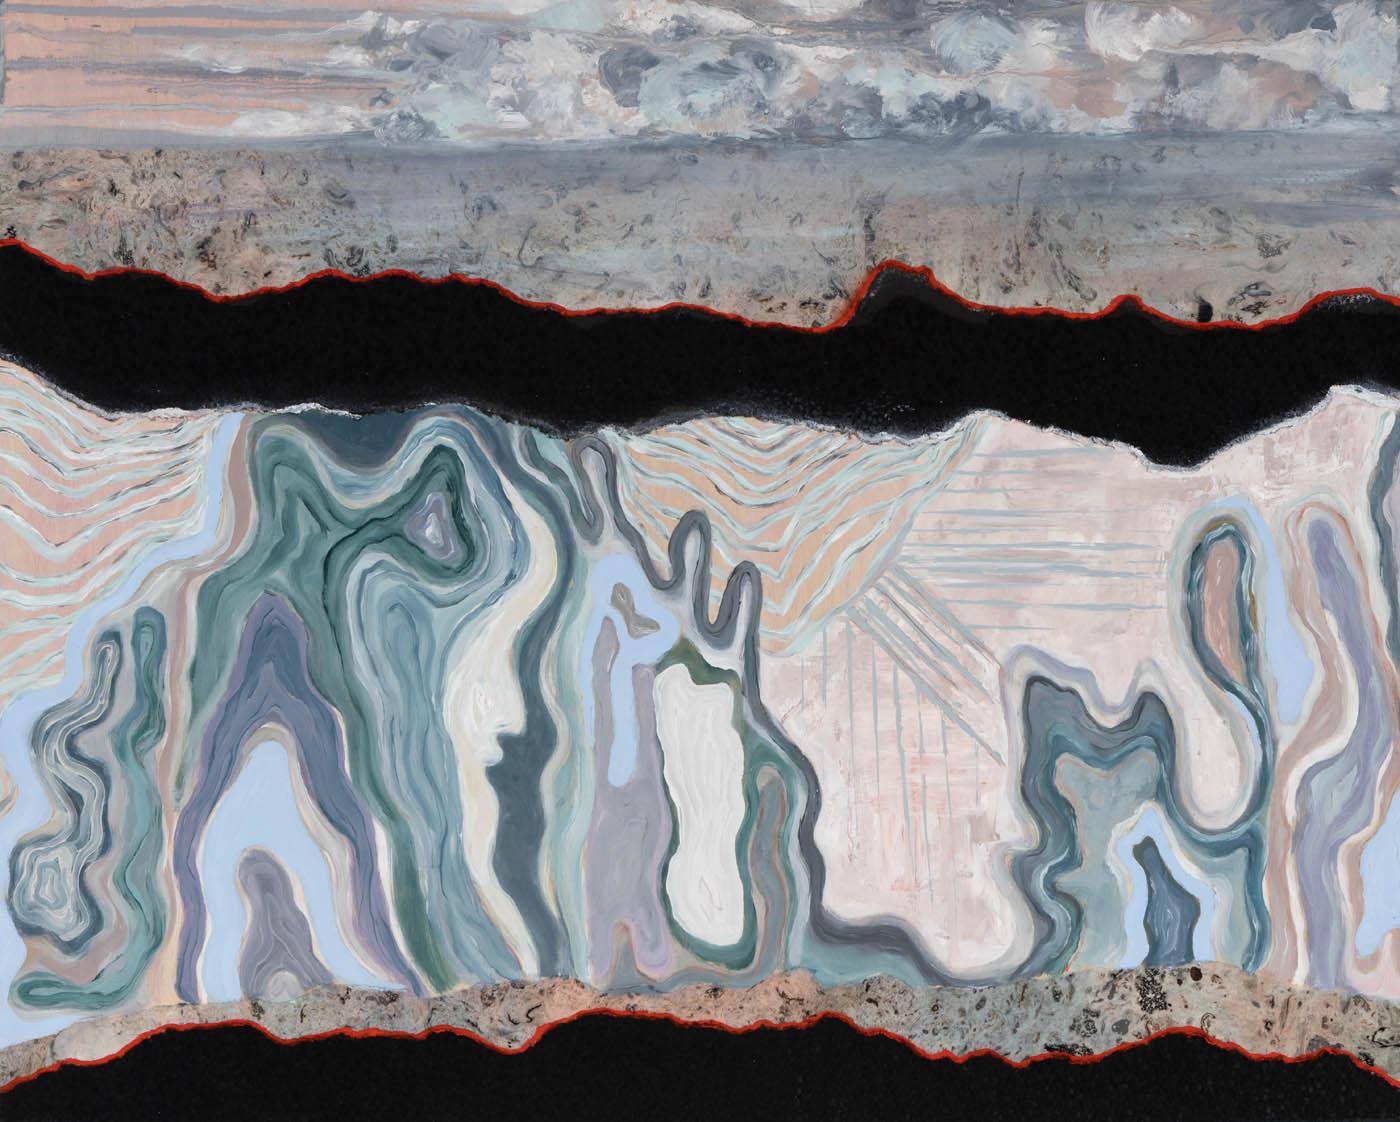 Emily L. McBurnett - Formations